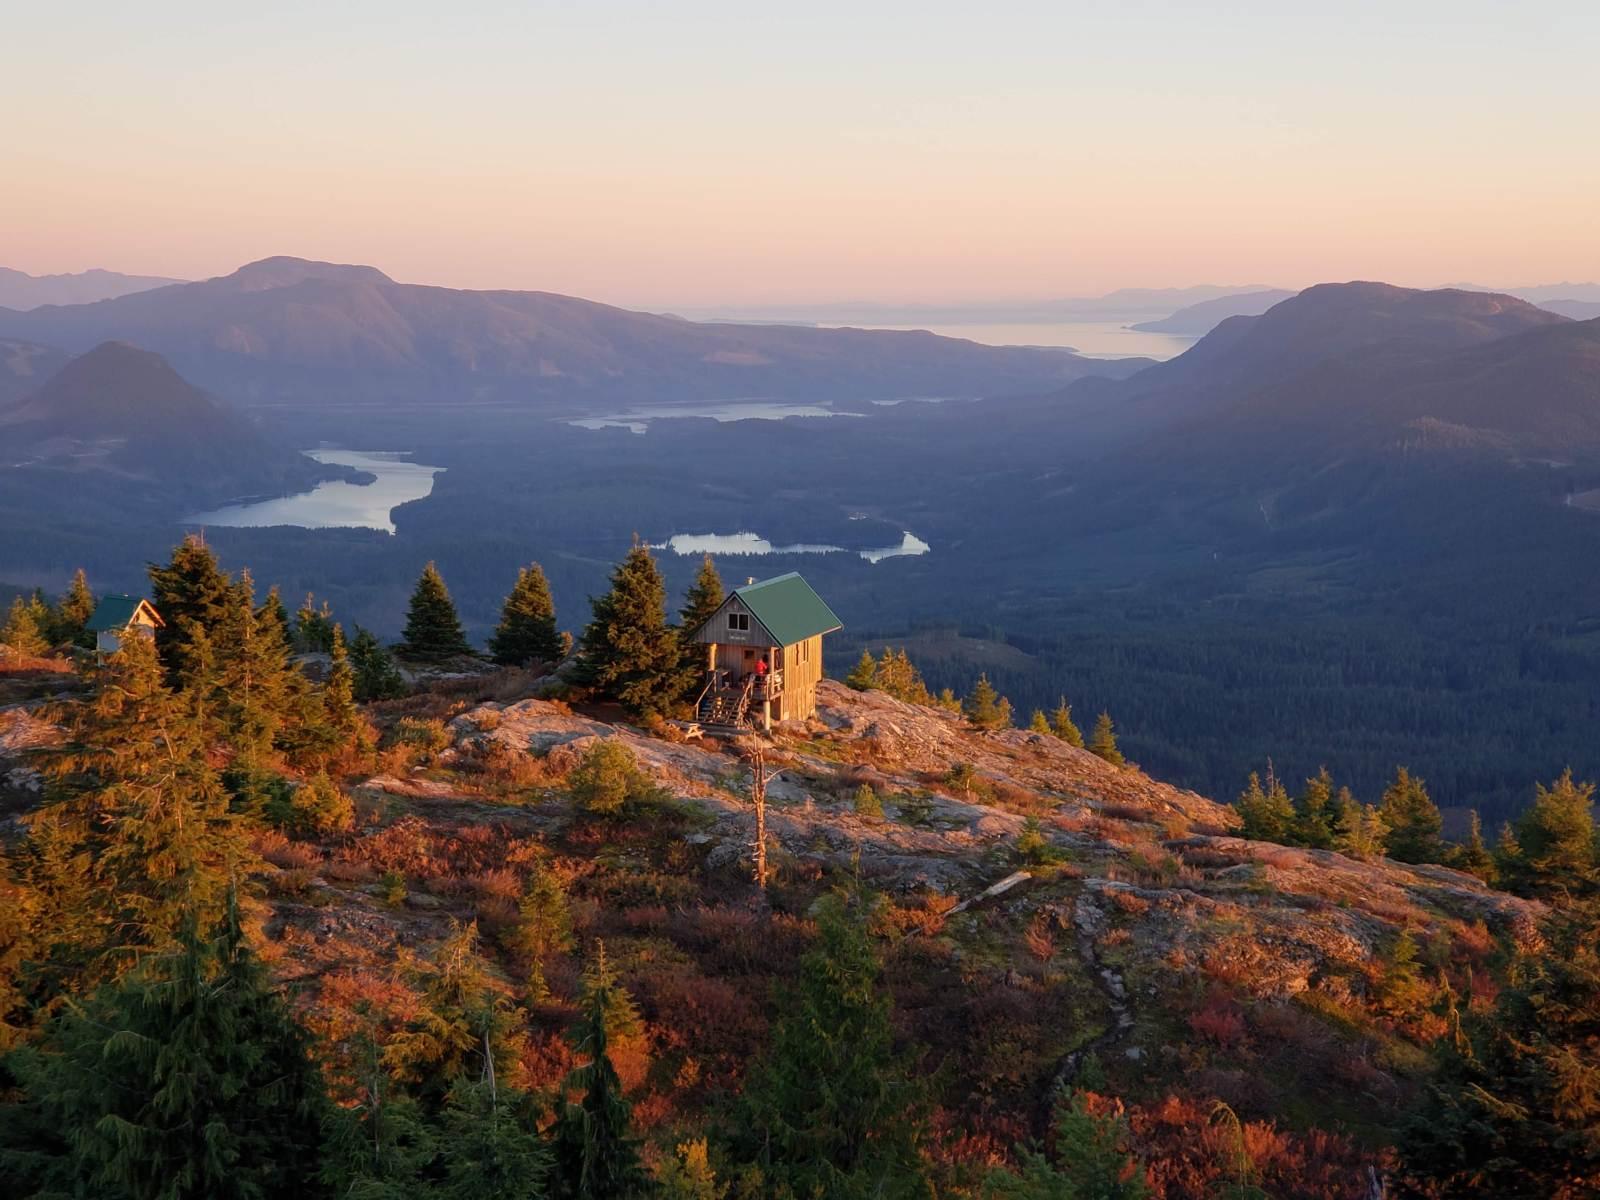 tin hat hut, tin hat cabin, backcountry huts bc, free camping bc, sunshine coast trail, bc backcountry shelters